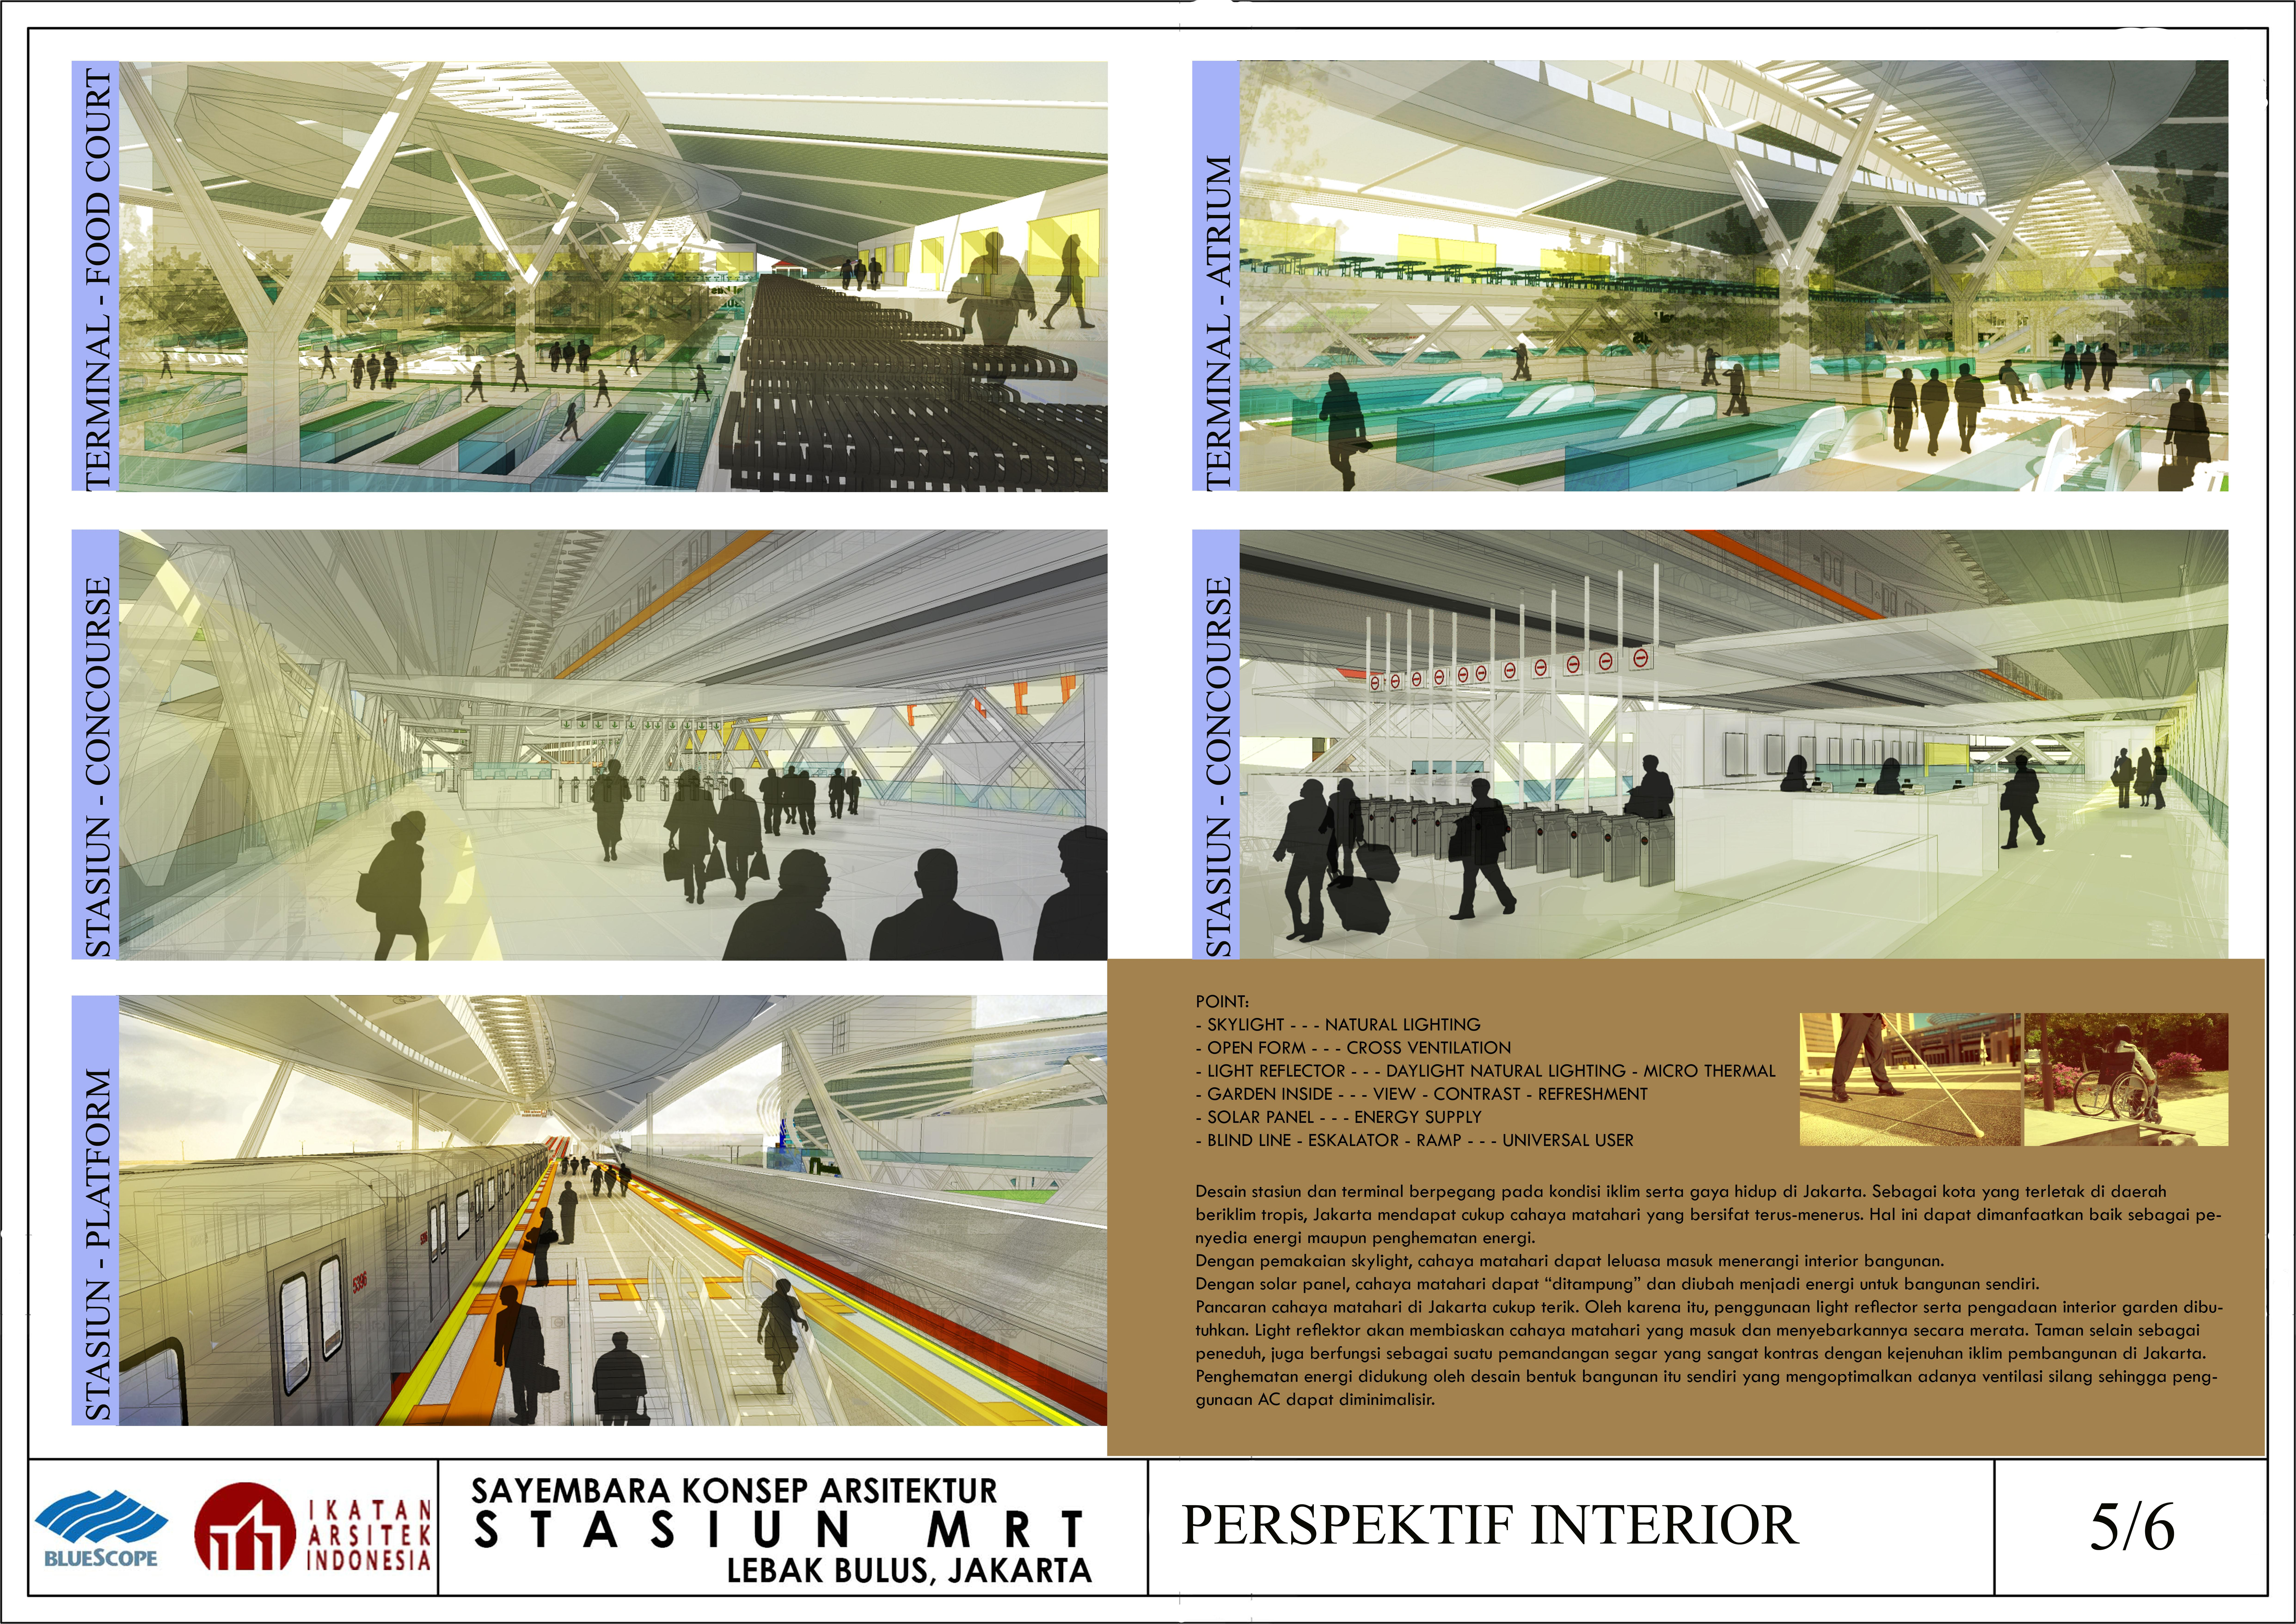 Sayembara stasiun MRT lebak bulus by emanuel agung wicaksono at